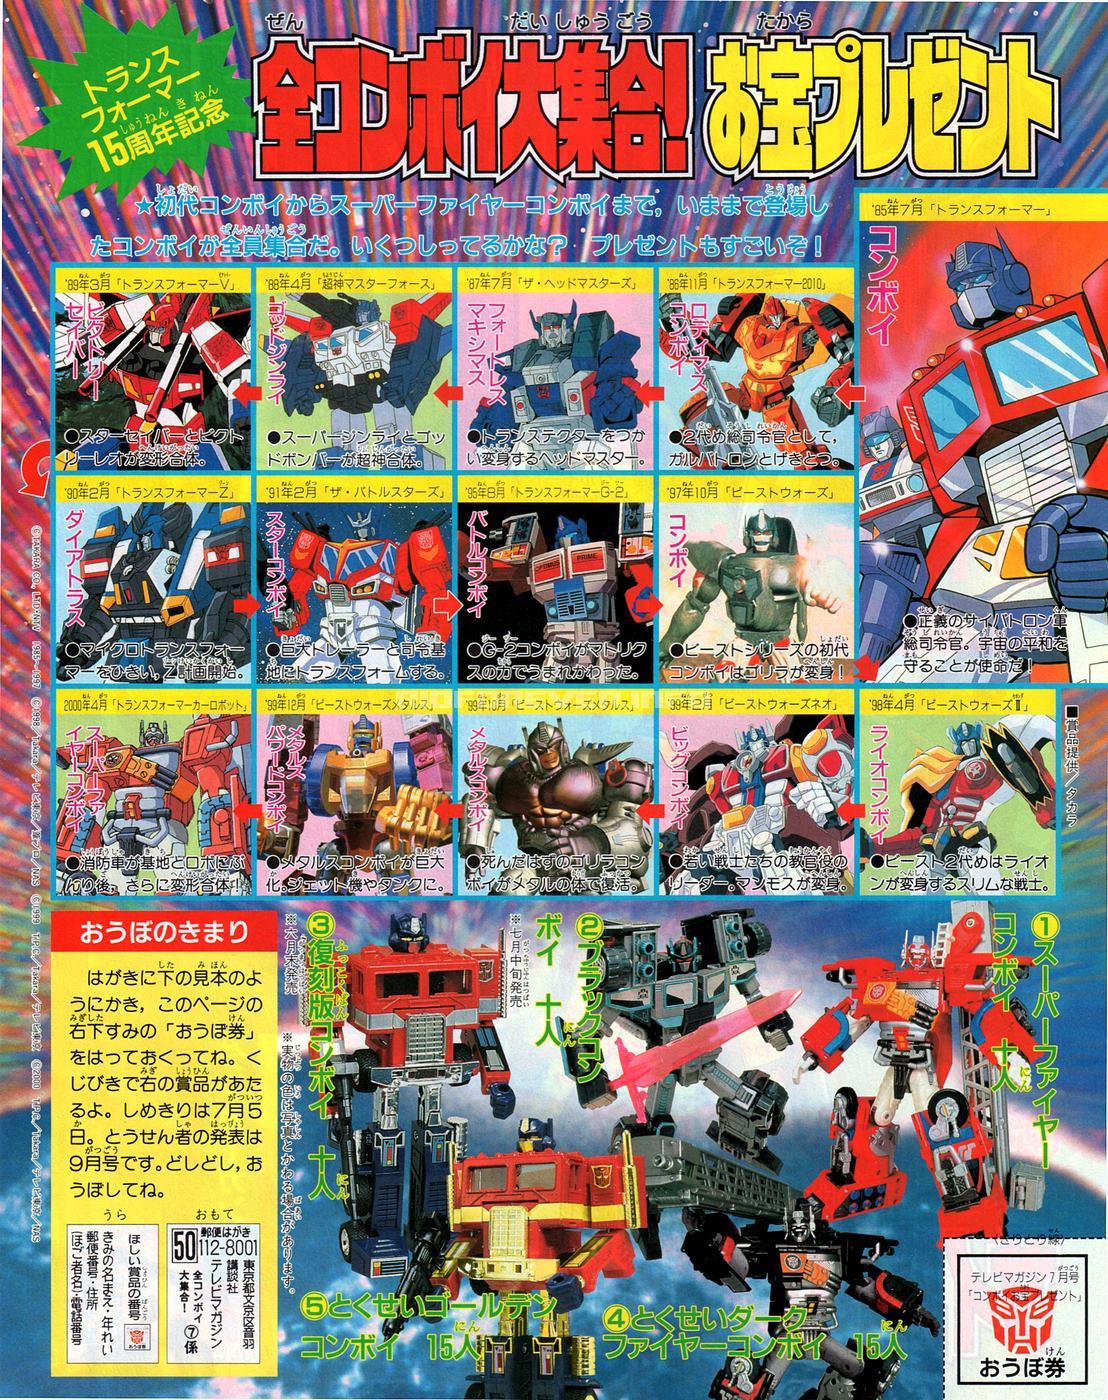 TV Magazine 2000-07-9